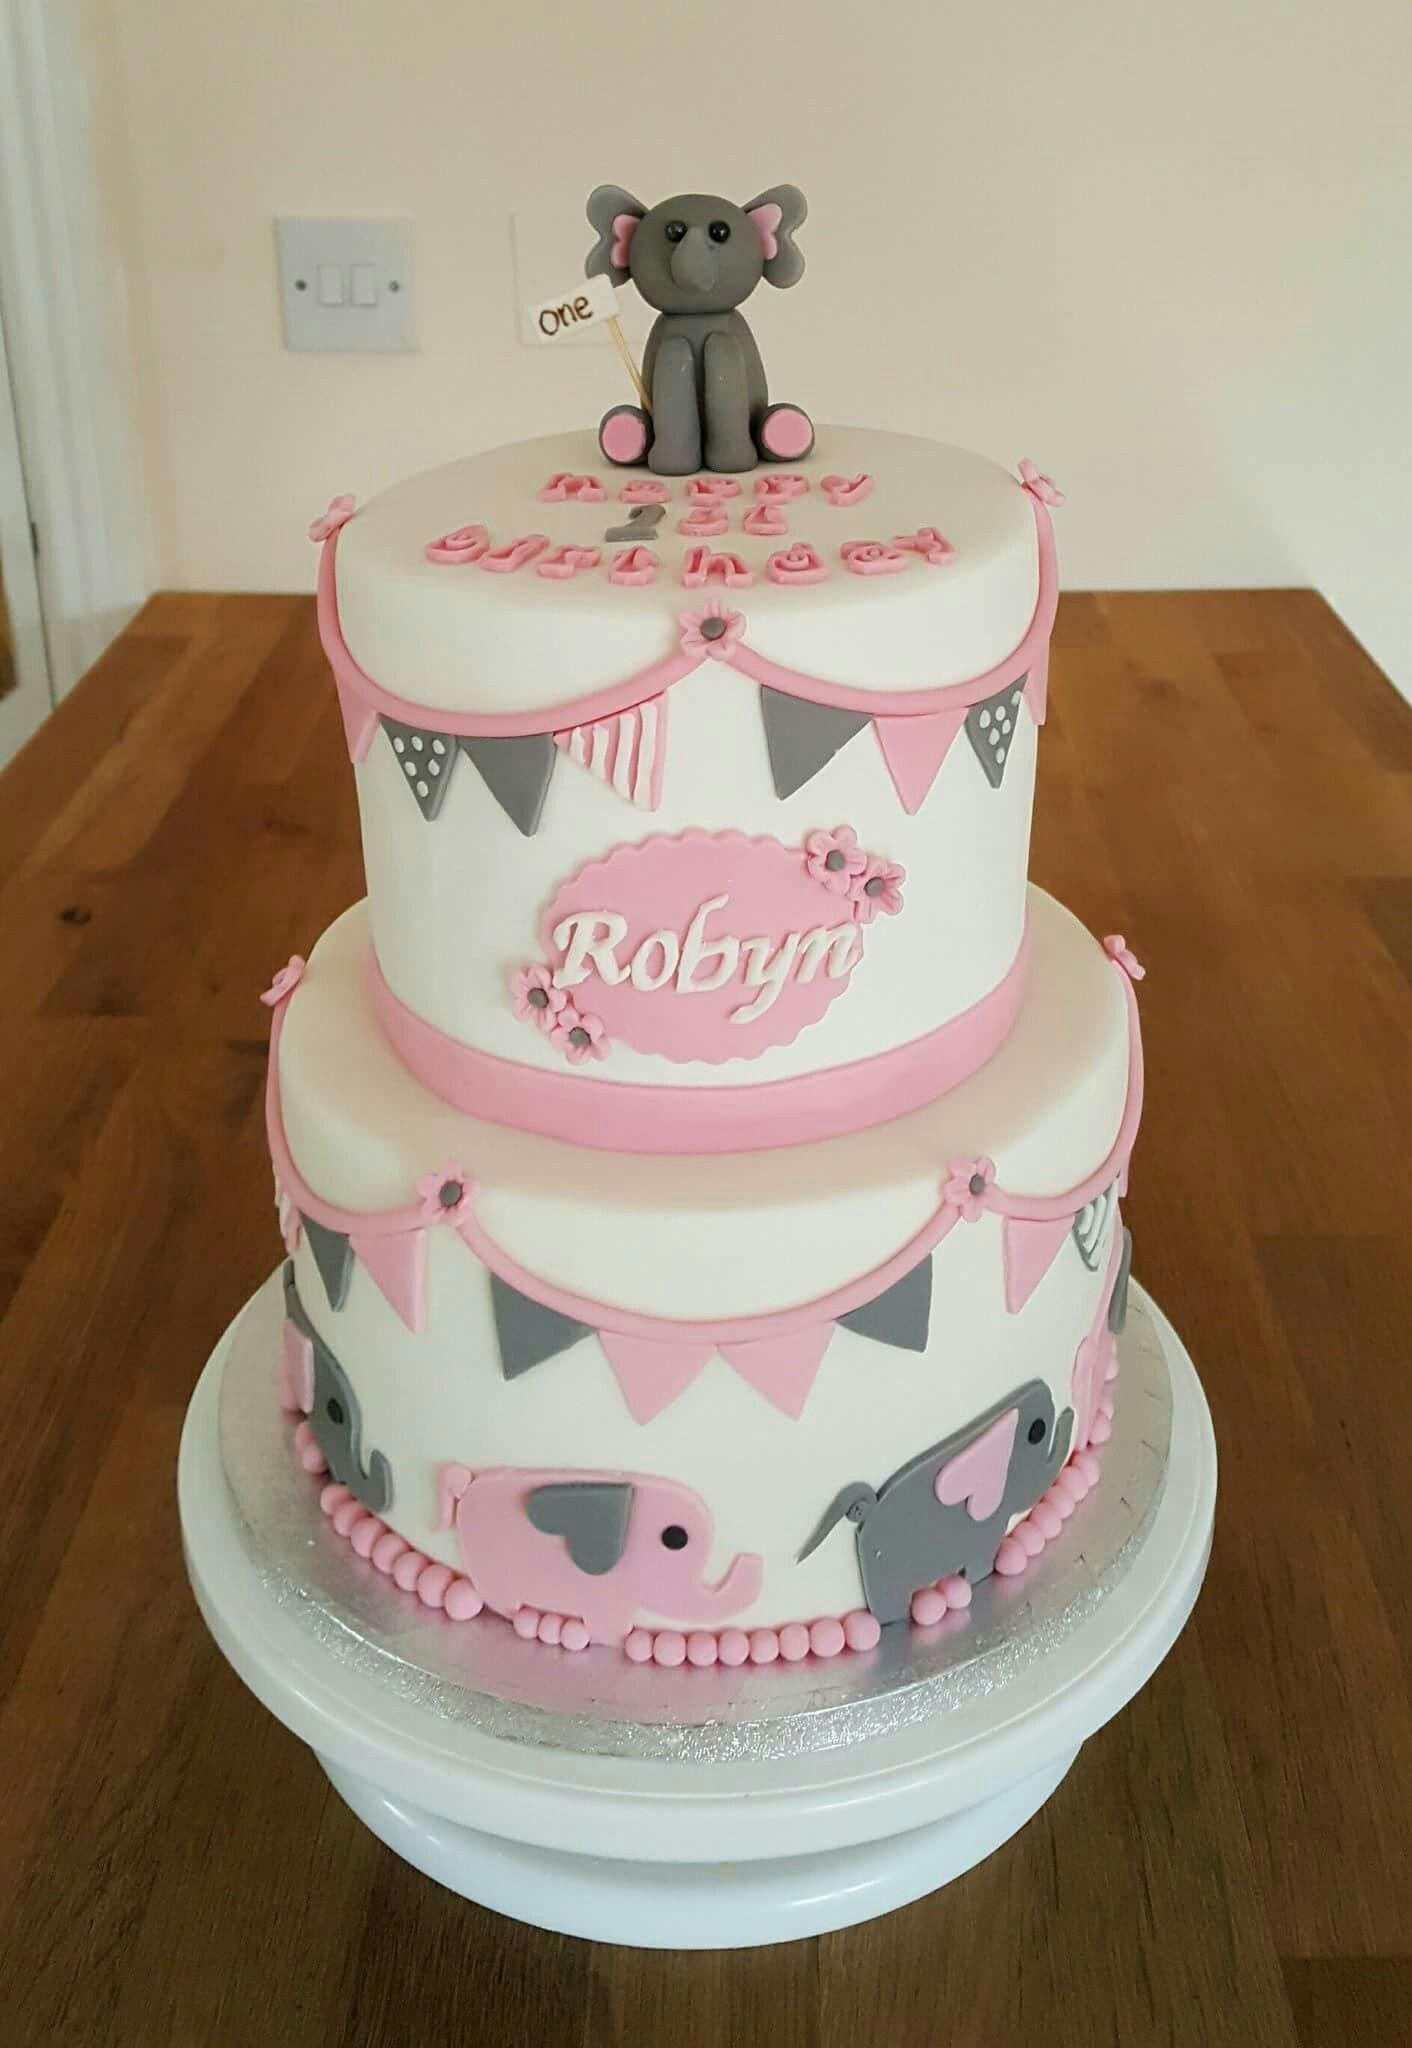 Phenomenal Elephant 1St Birthday Cake Elephant Birthday Cakes Elephant Funny Birthday Cards Online Fluifree Goldxyz